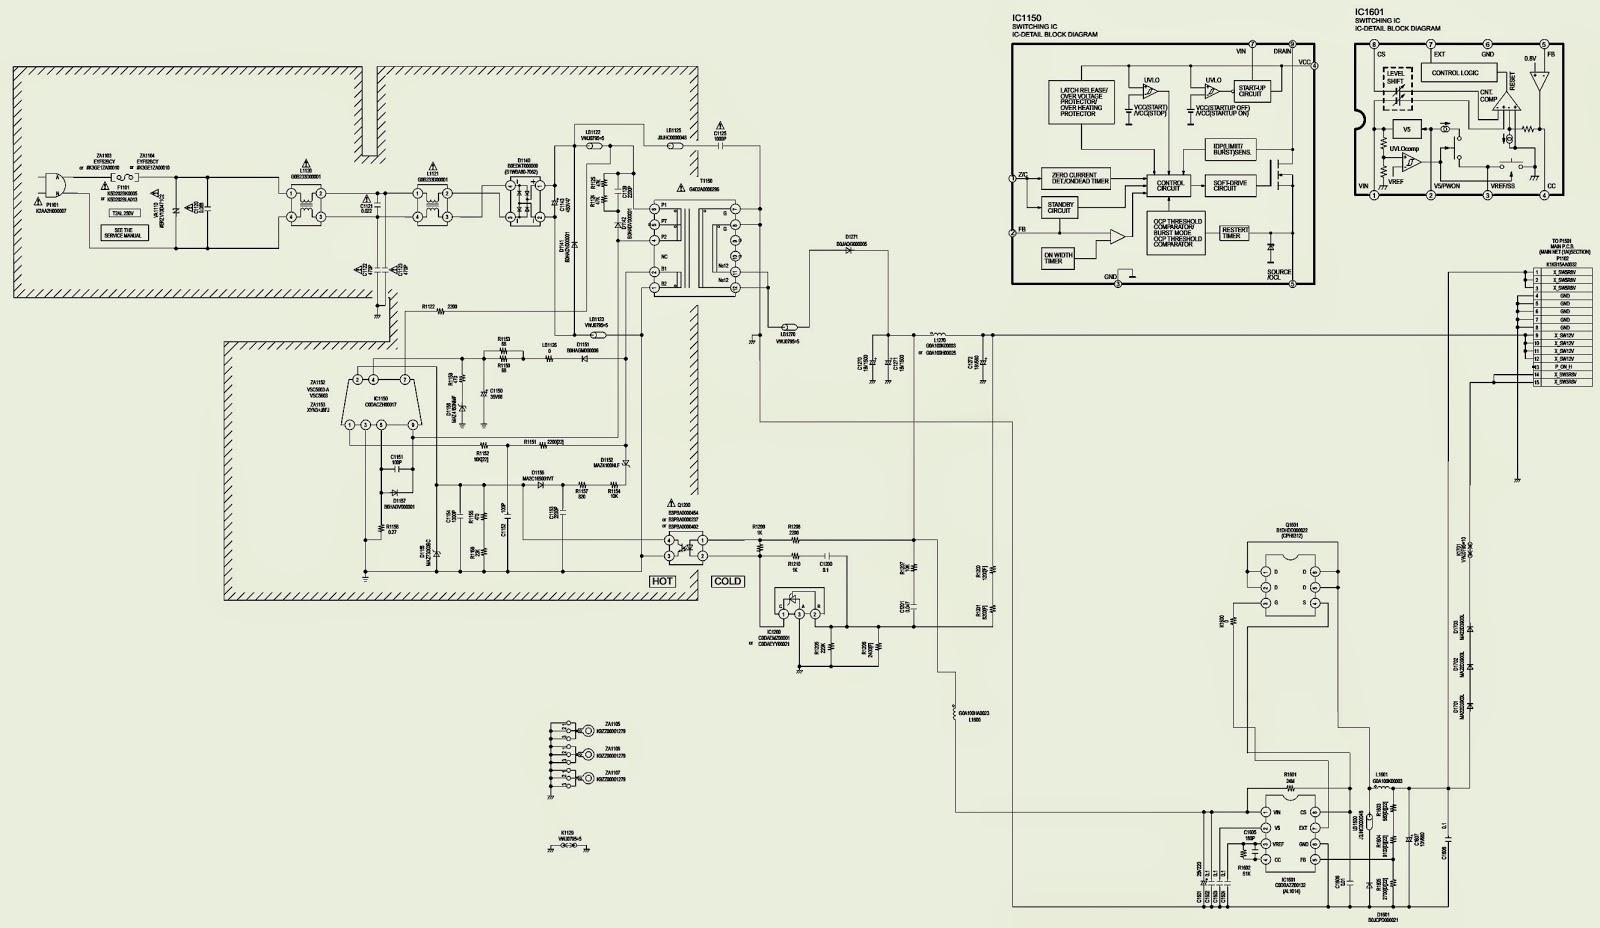 Panasonic Dmr-es18gca   Dvd Recorder